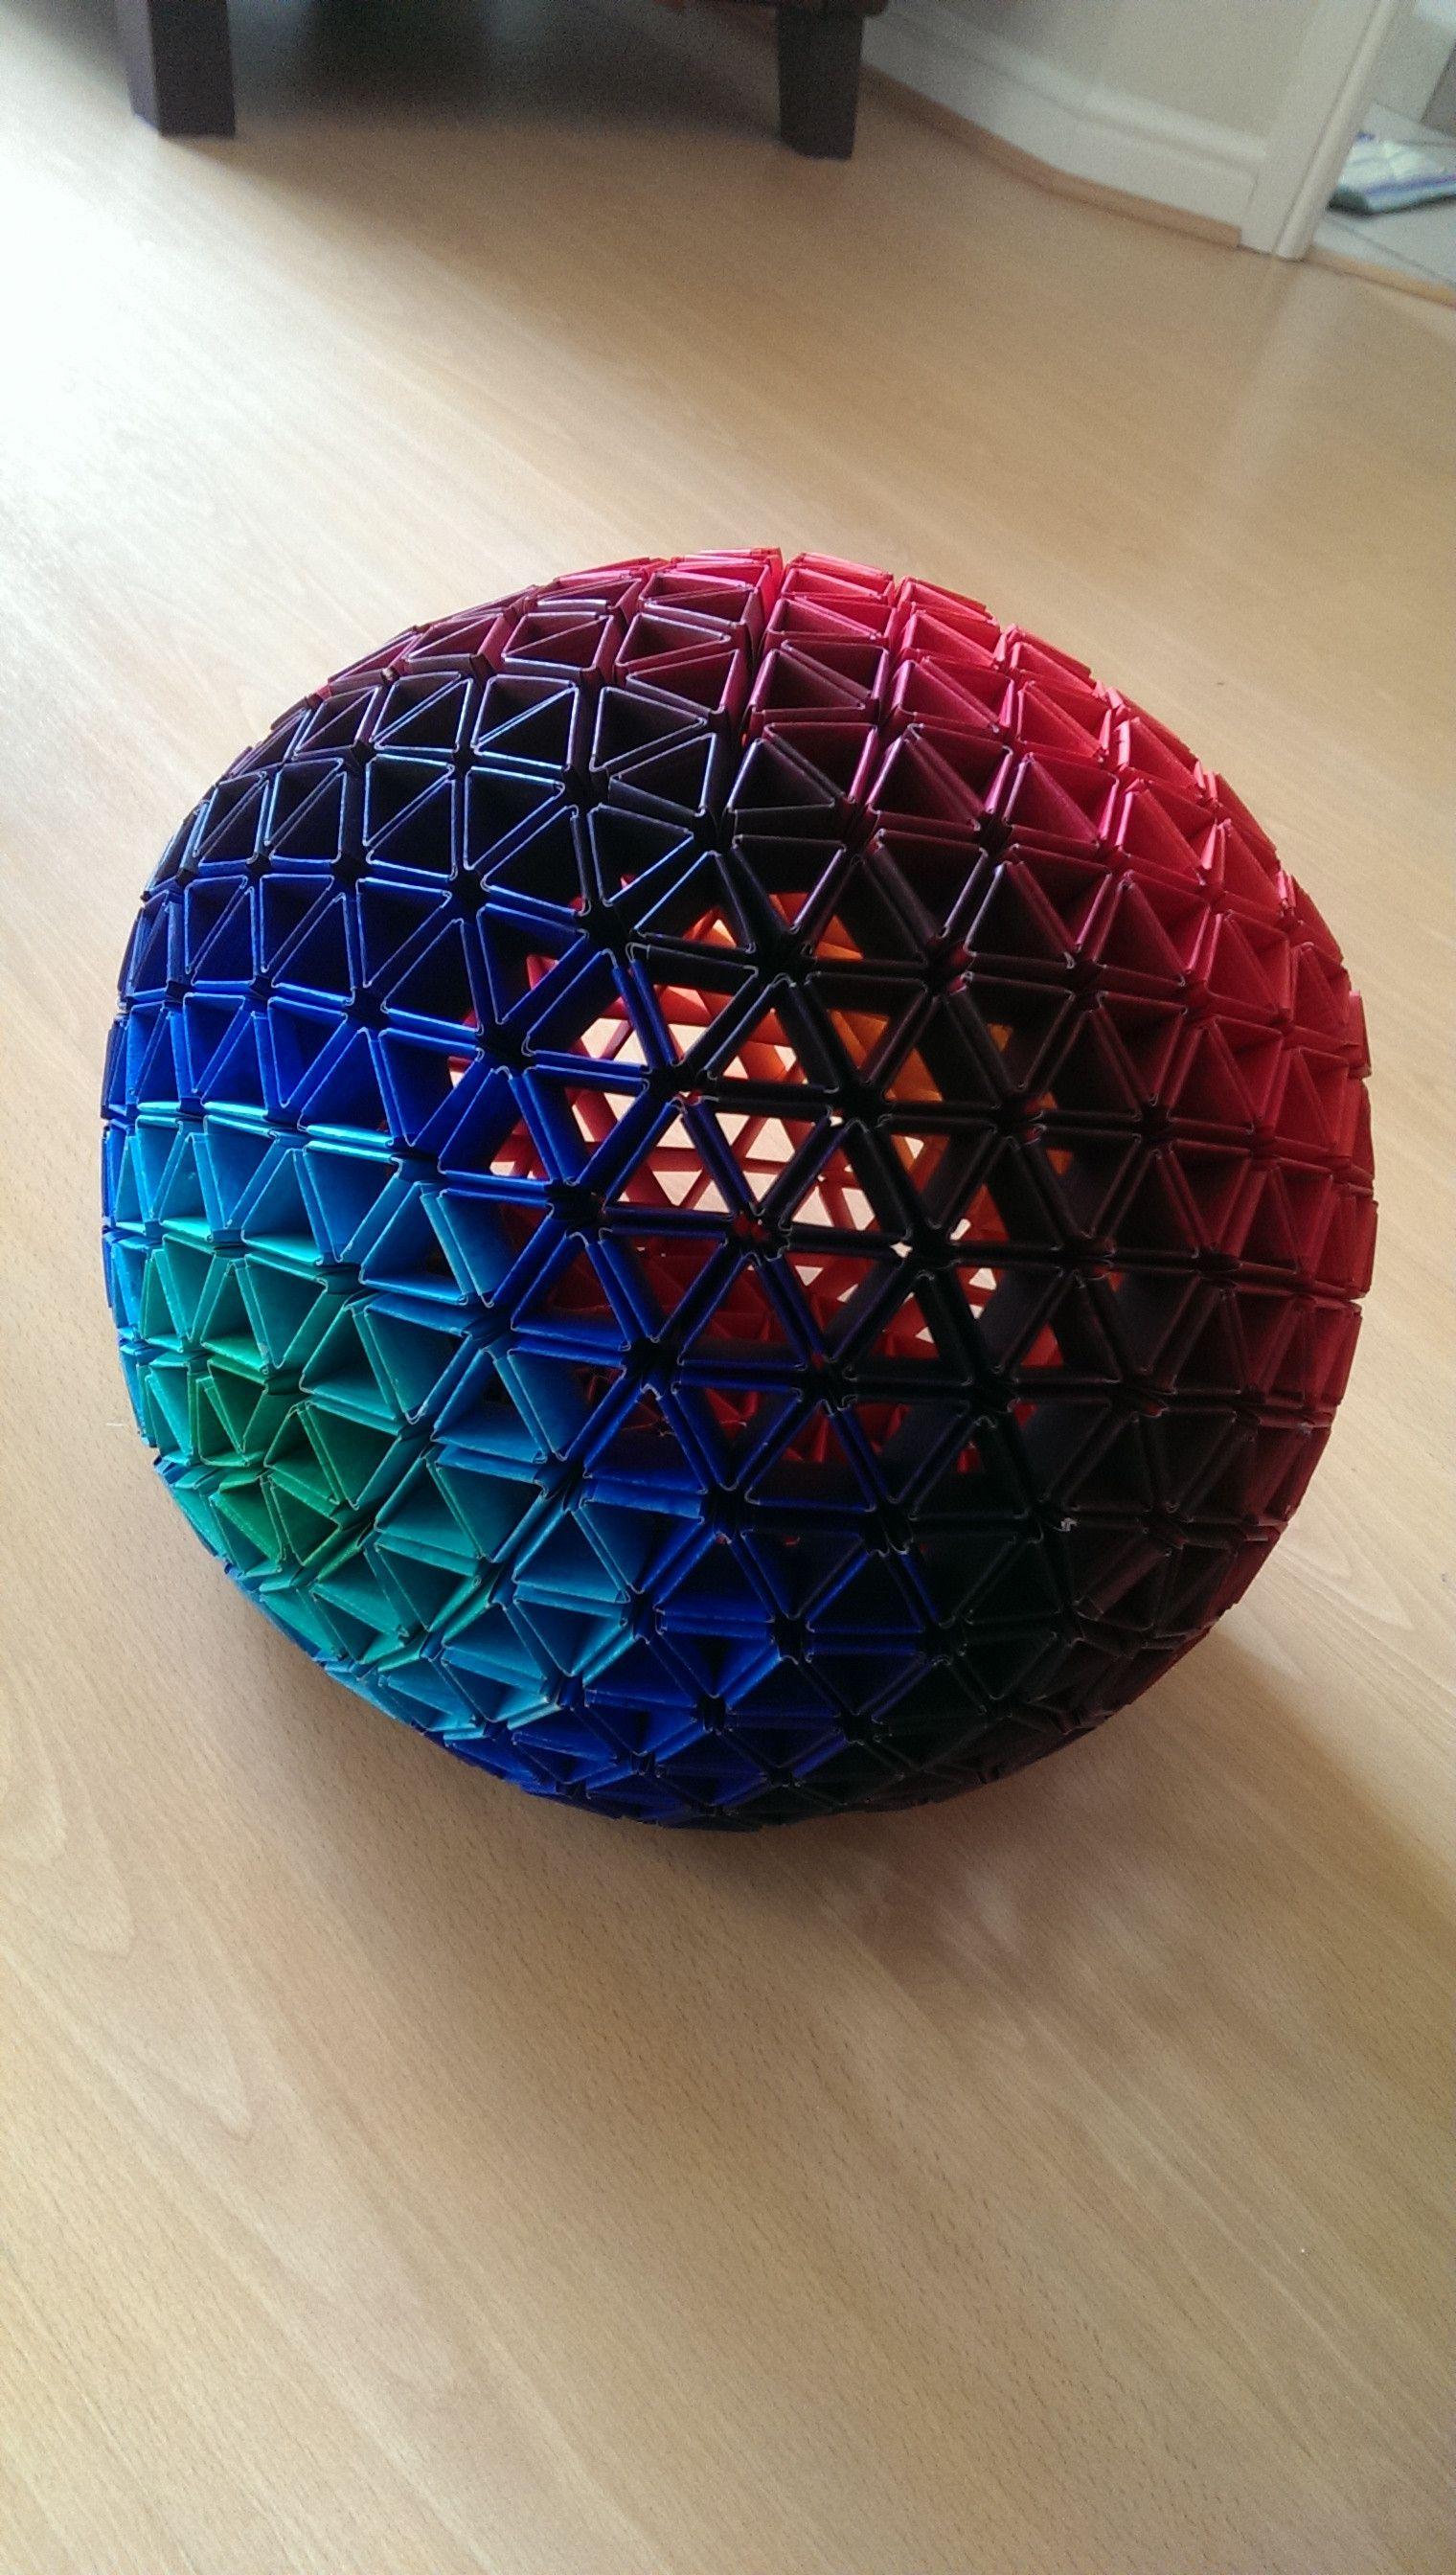 geodesic sphere instructions   Art   ペーパークラフト, 折り紙, ユニット折り紙 - photo#18